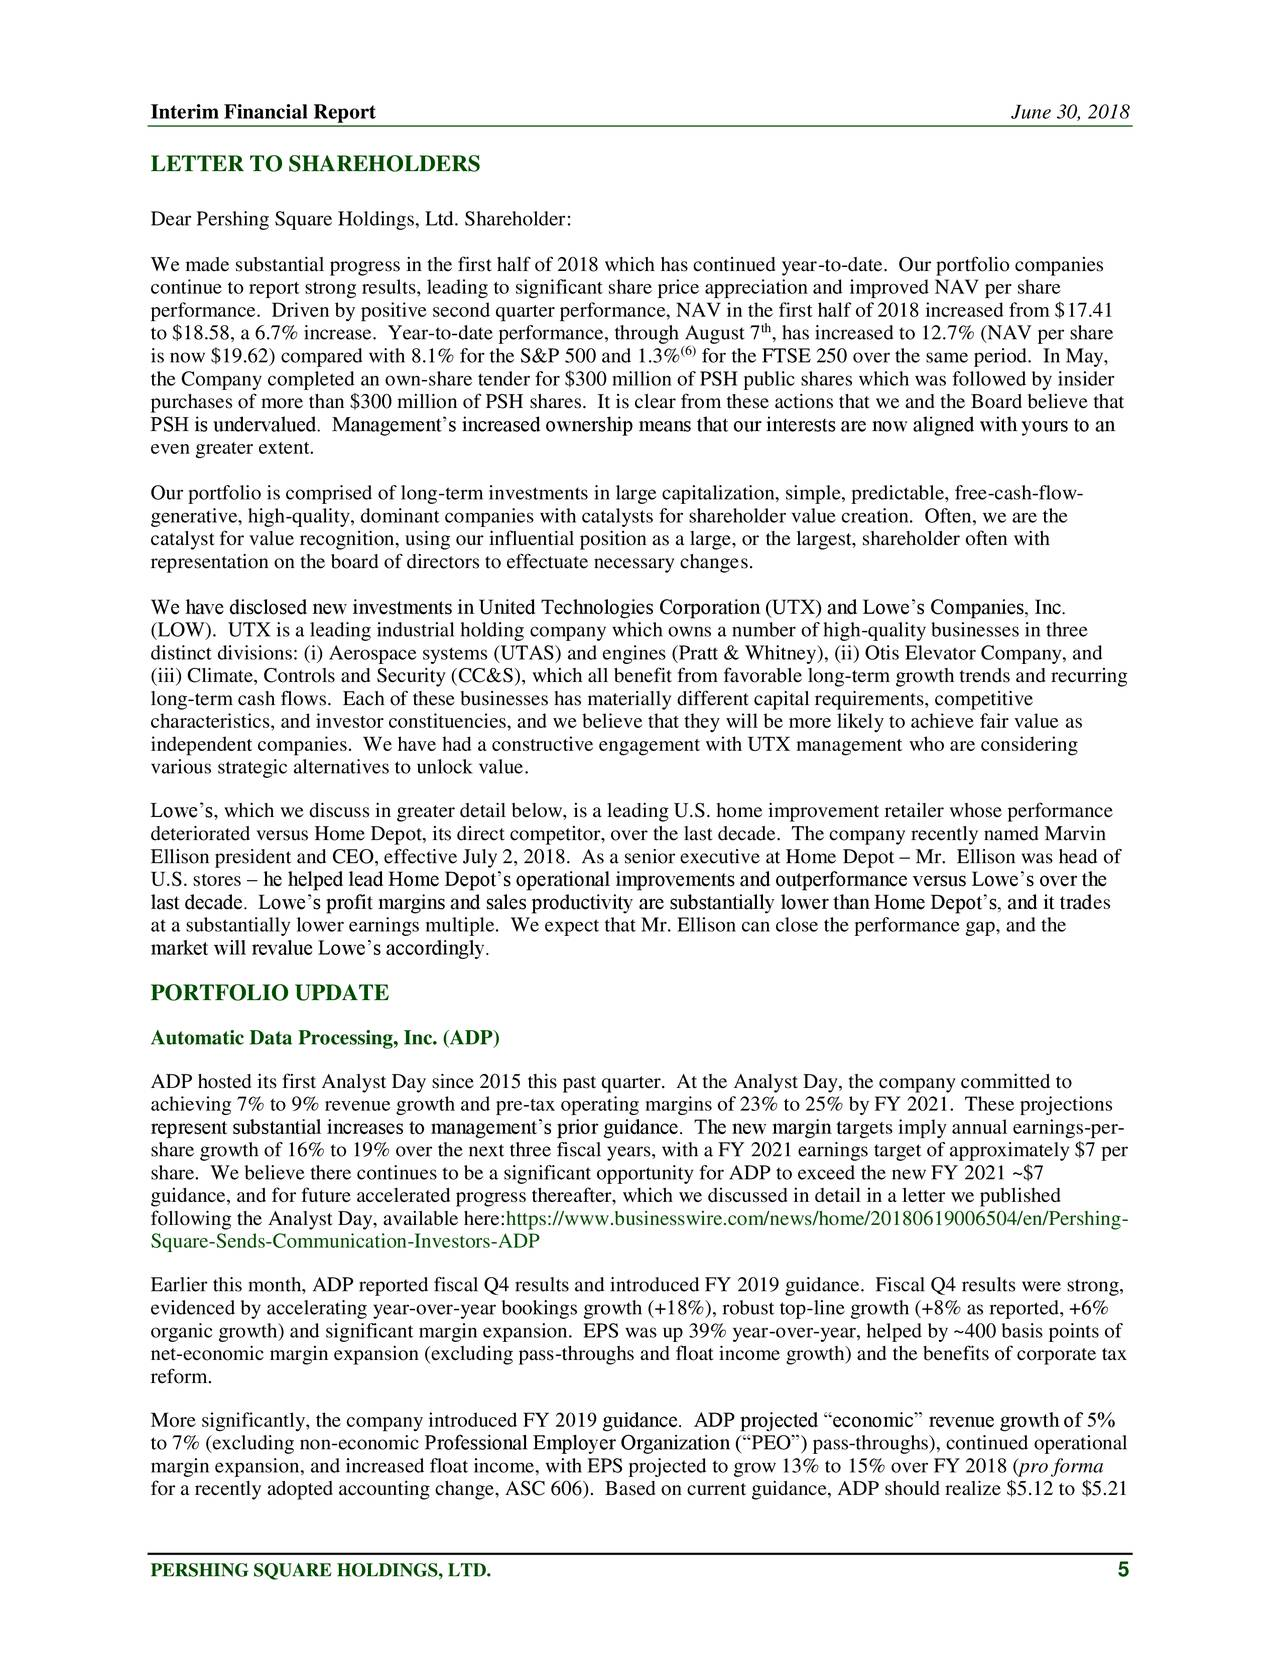 Target corporation ackman versus the board